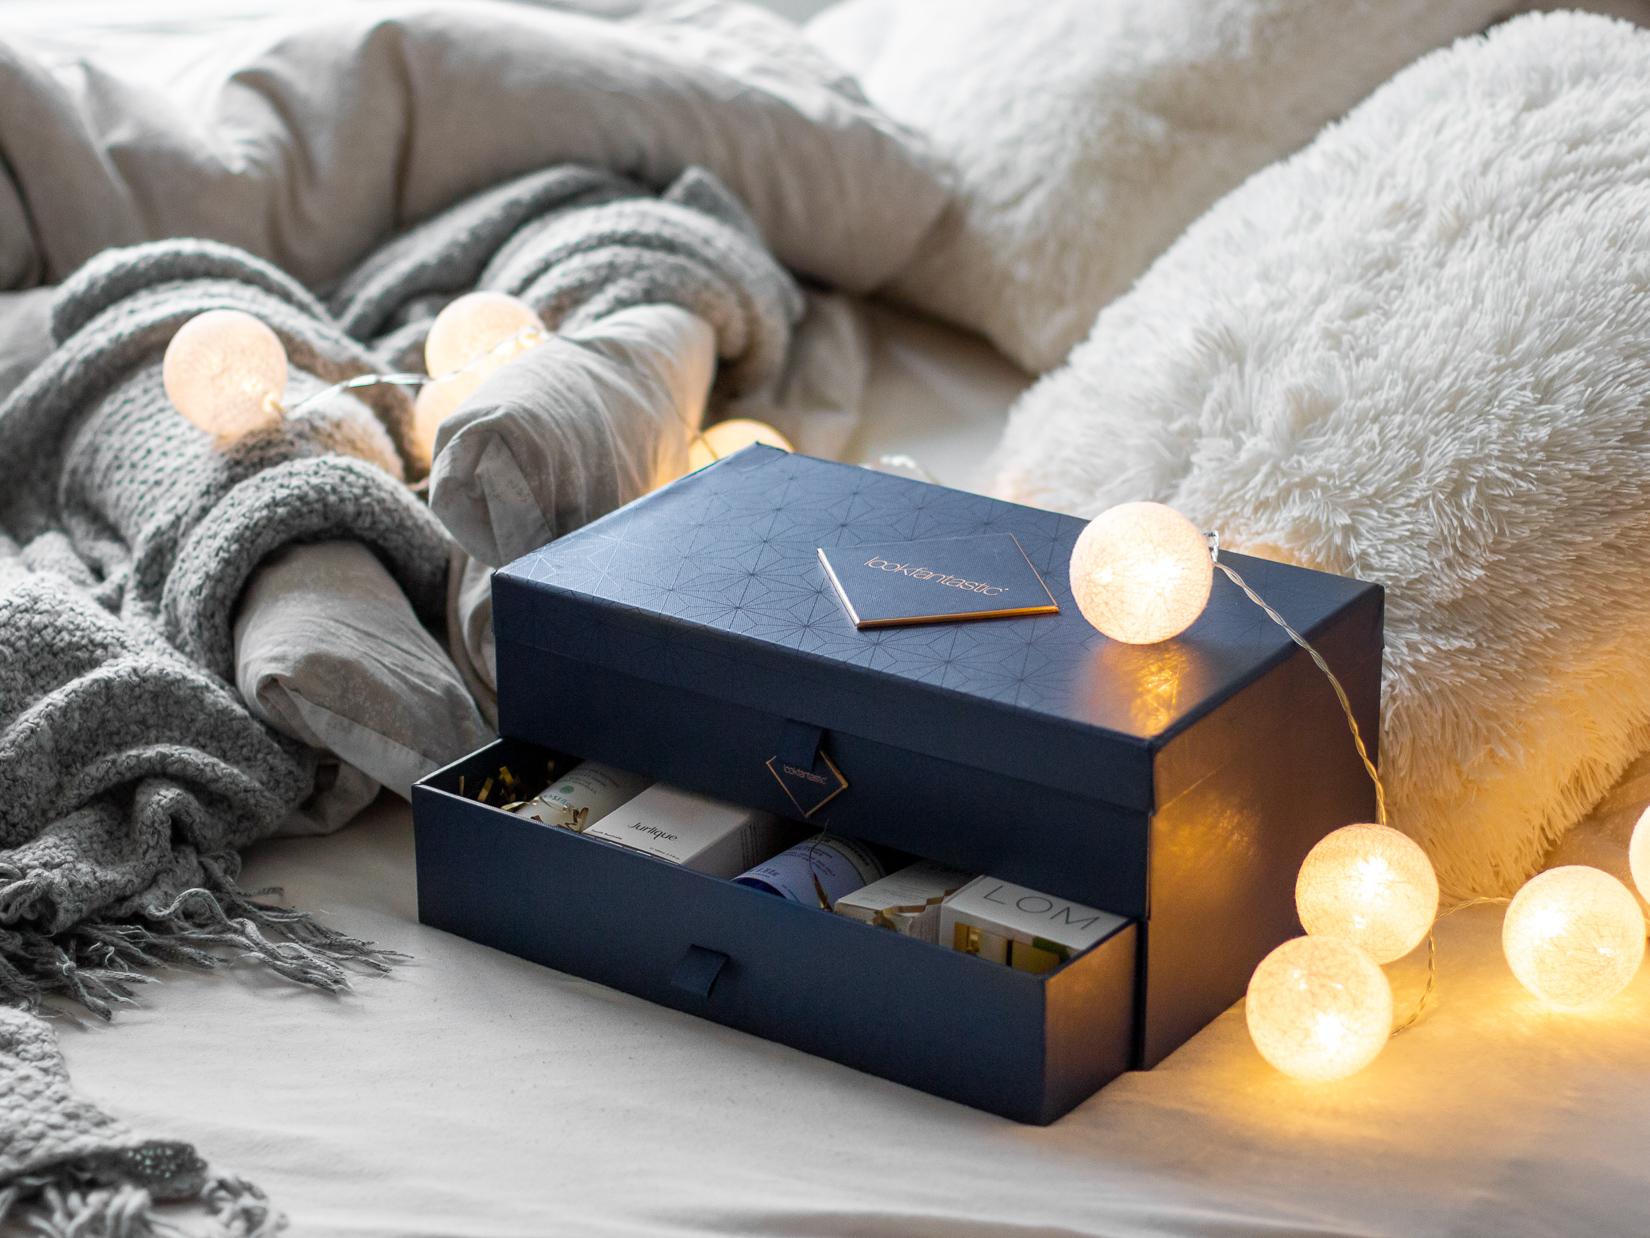 lookfantastic beauty chest tipy na dárky 2019